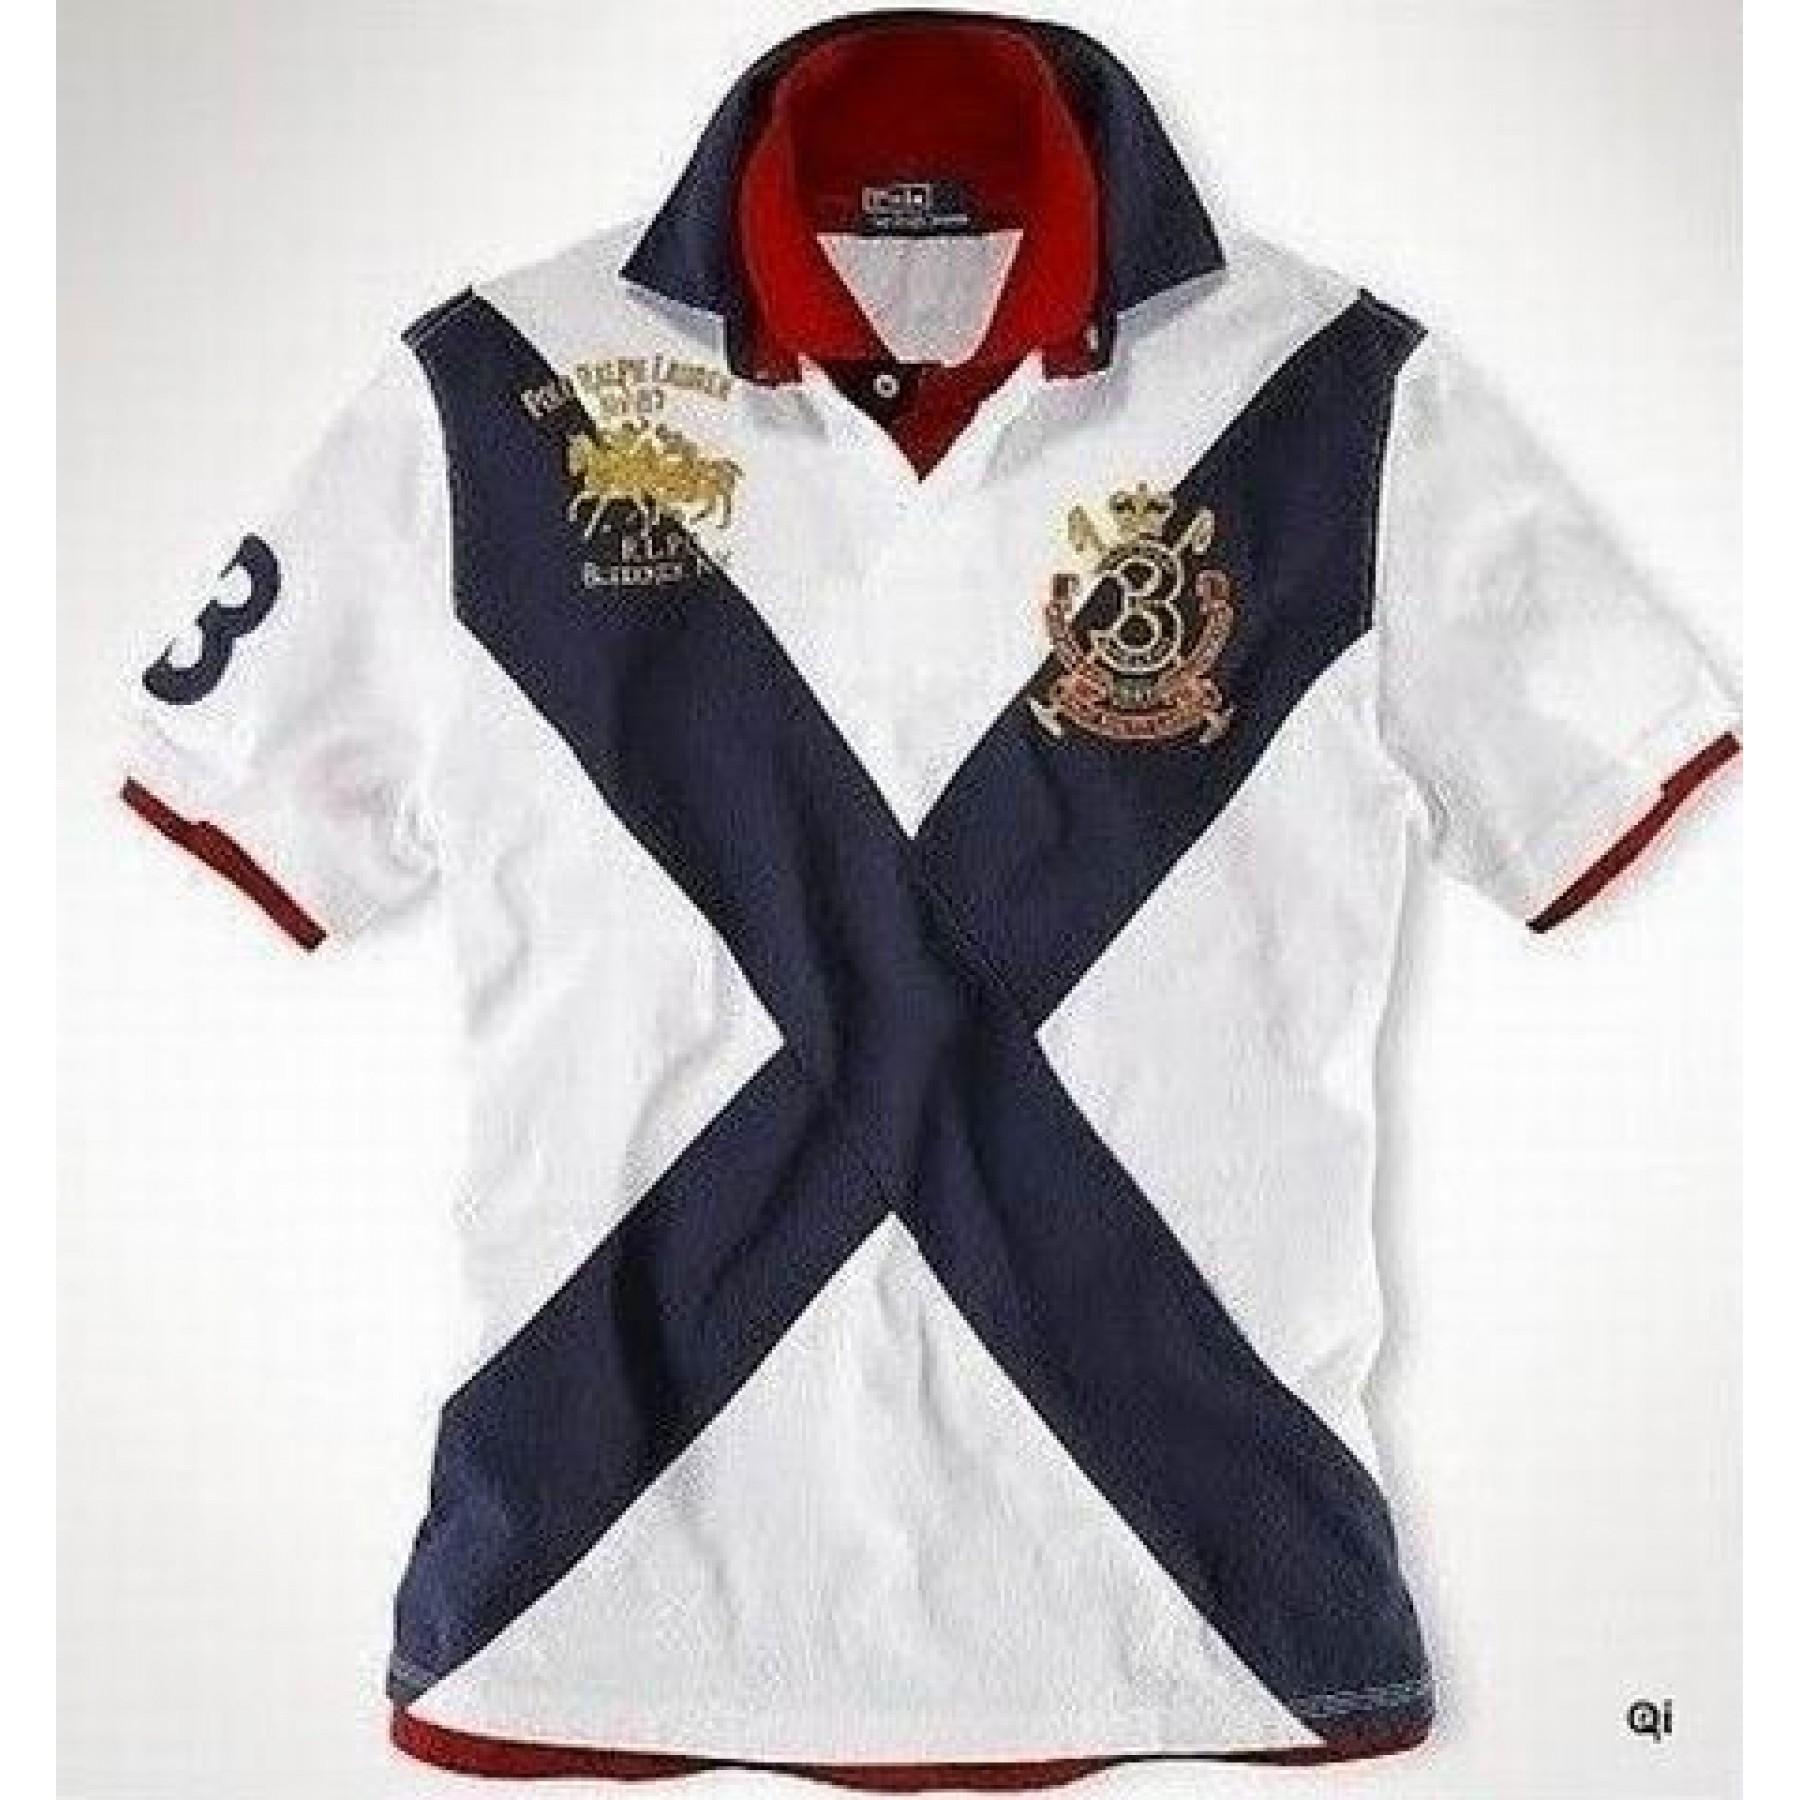 Camisa Polo Ralph Lauren Masculino Cod 0294 2551fc8613adf